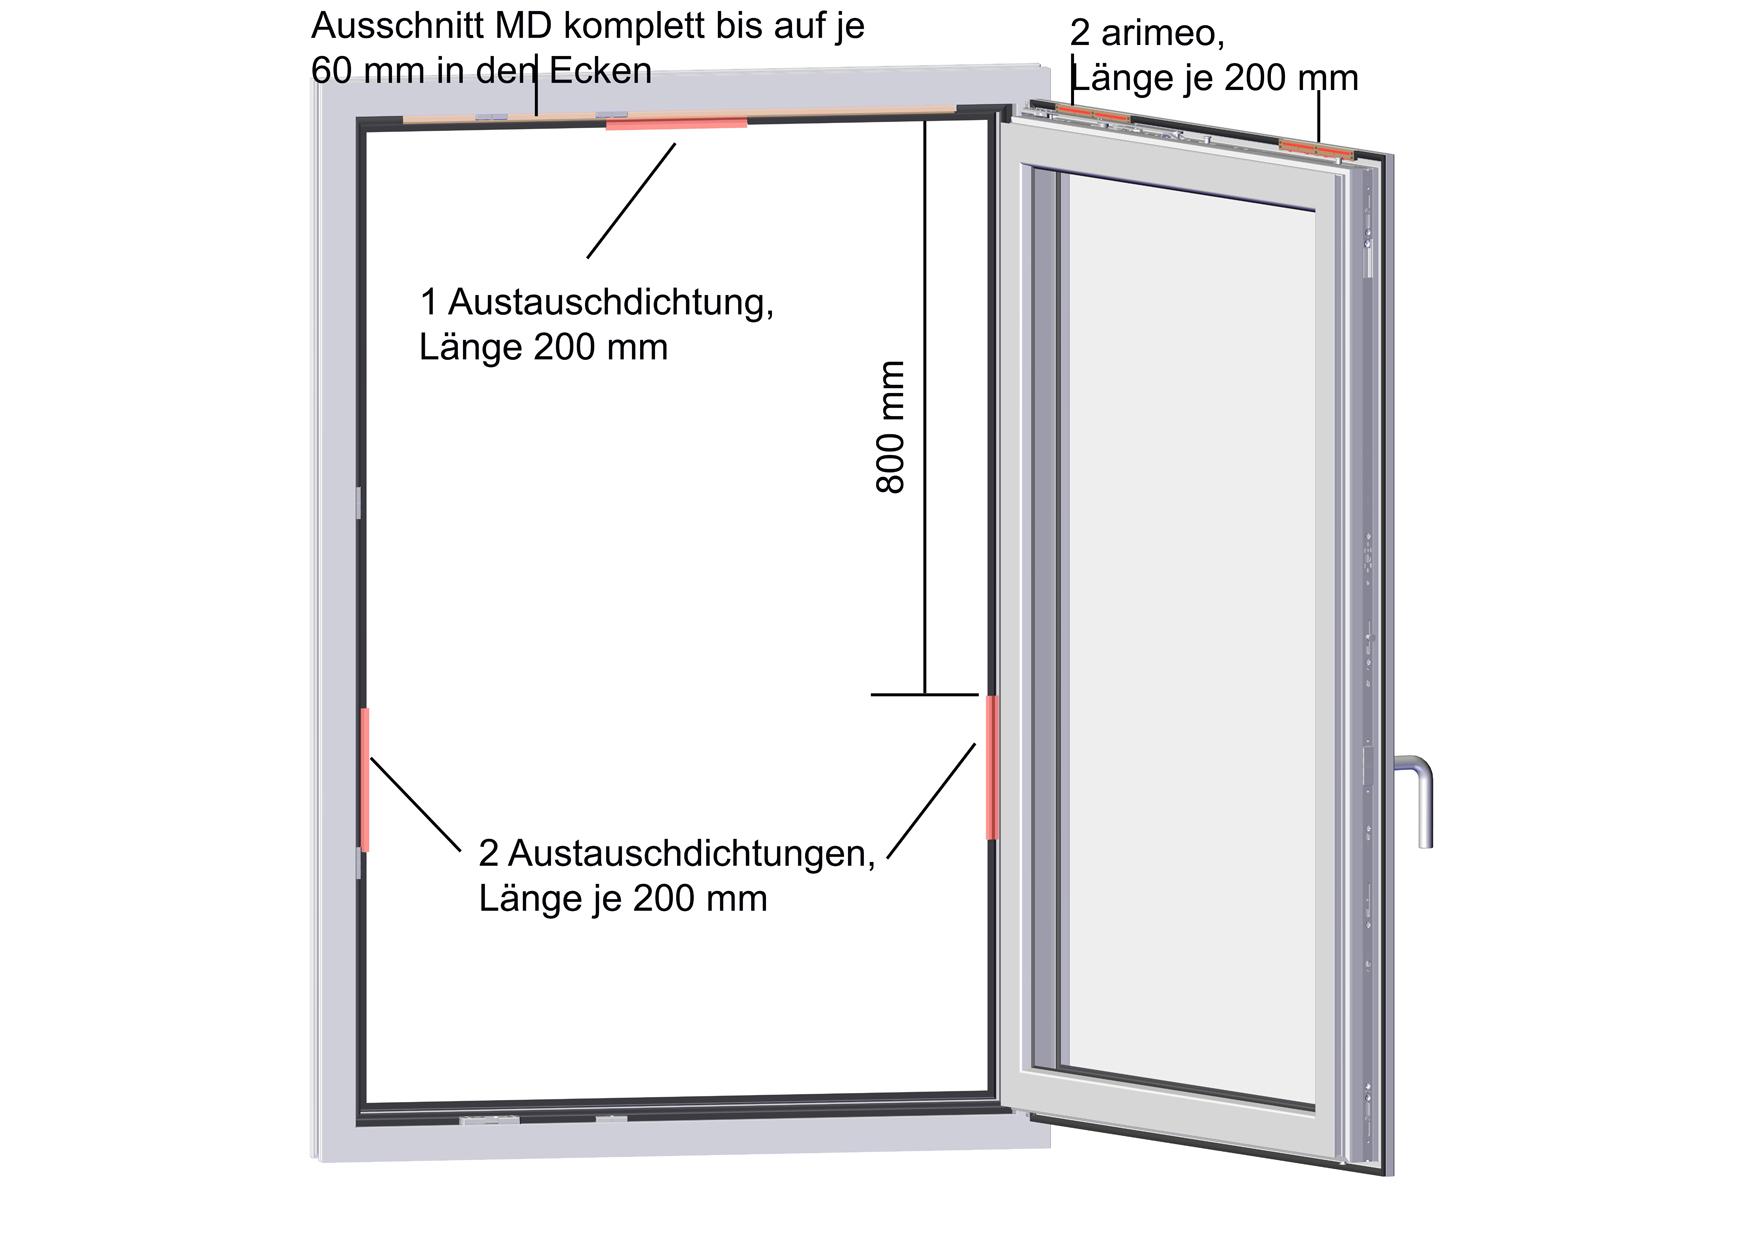 arimeo classic S Fensterfalzlüfter Einbauvariante double MD